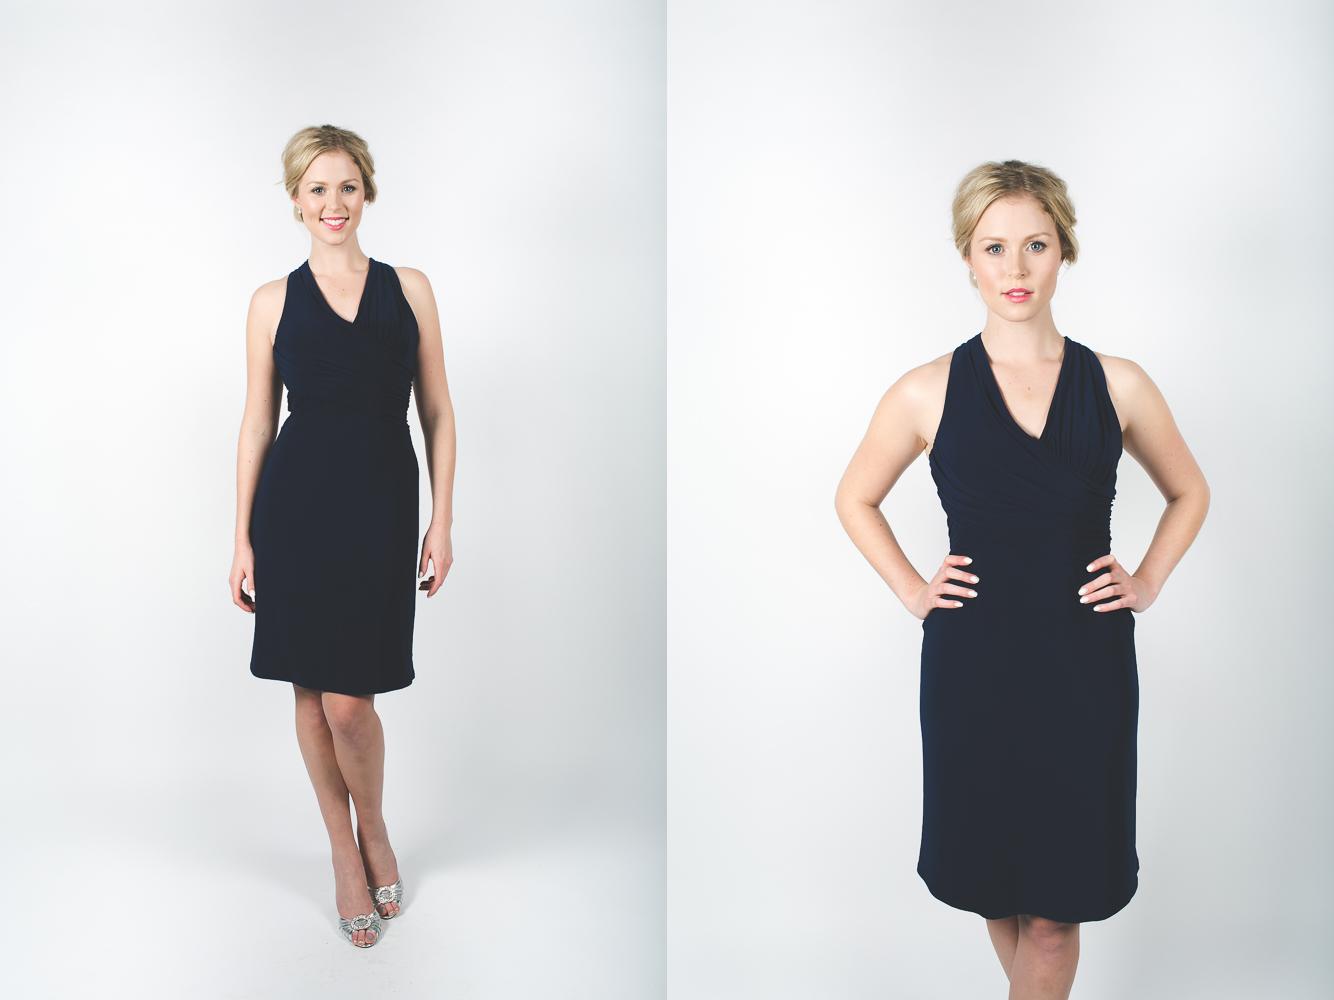 TRENDY PROM FORMAL DRESSES PLUSH BOUTIQUE SEMI-FORMAL 56ca54798